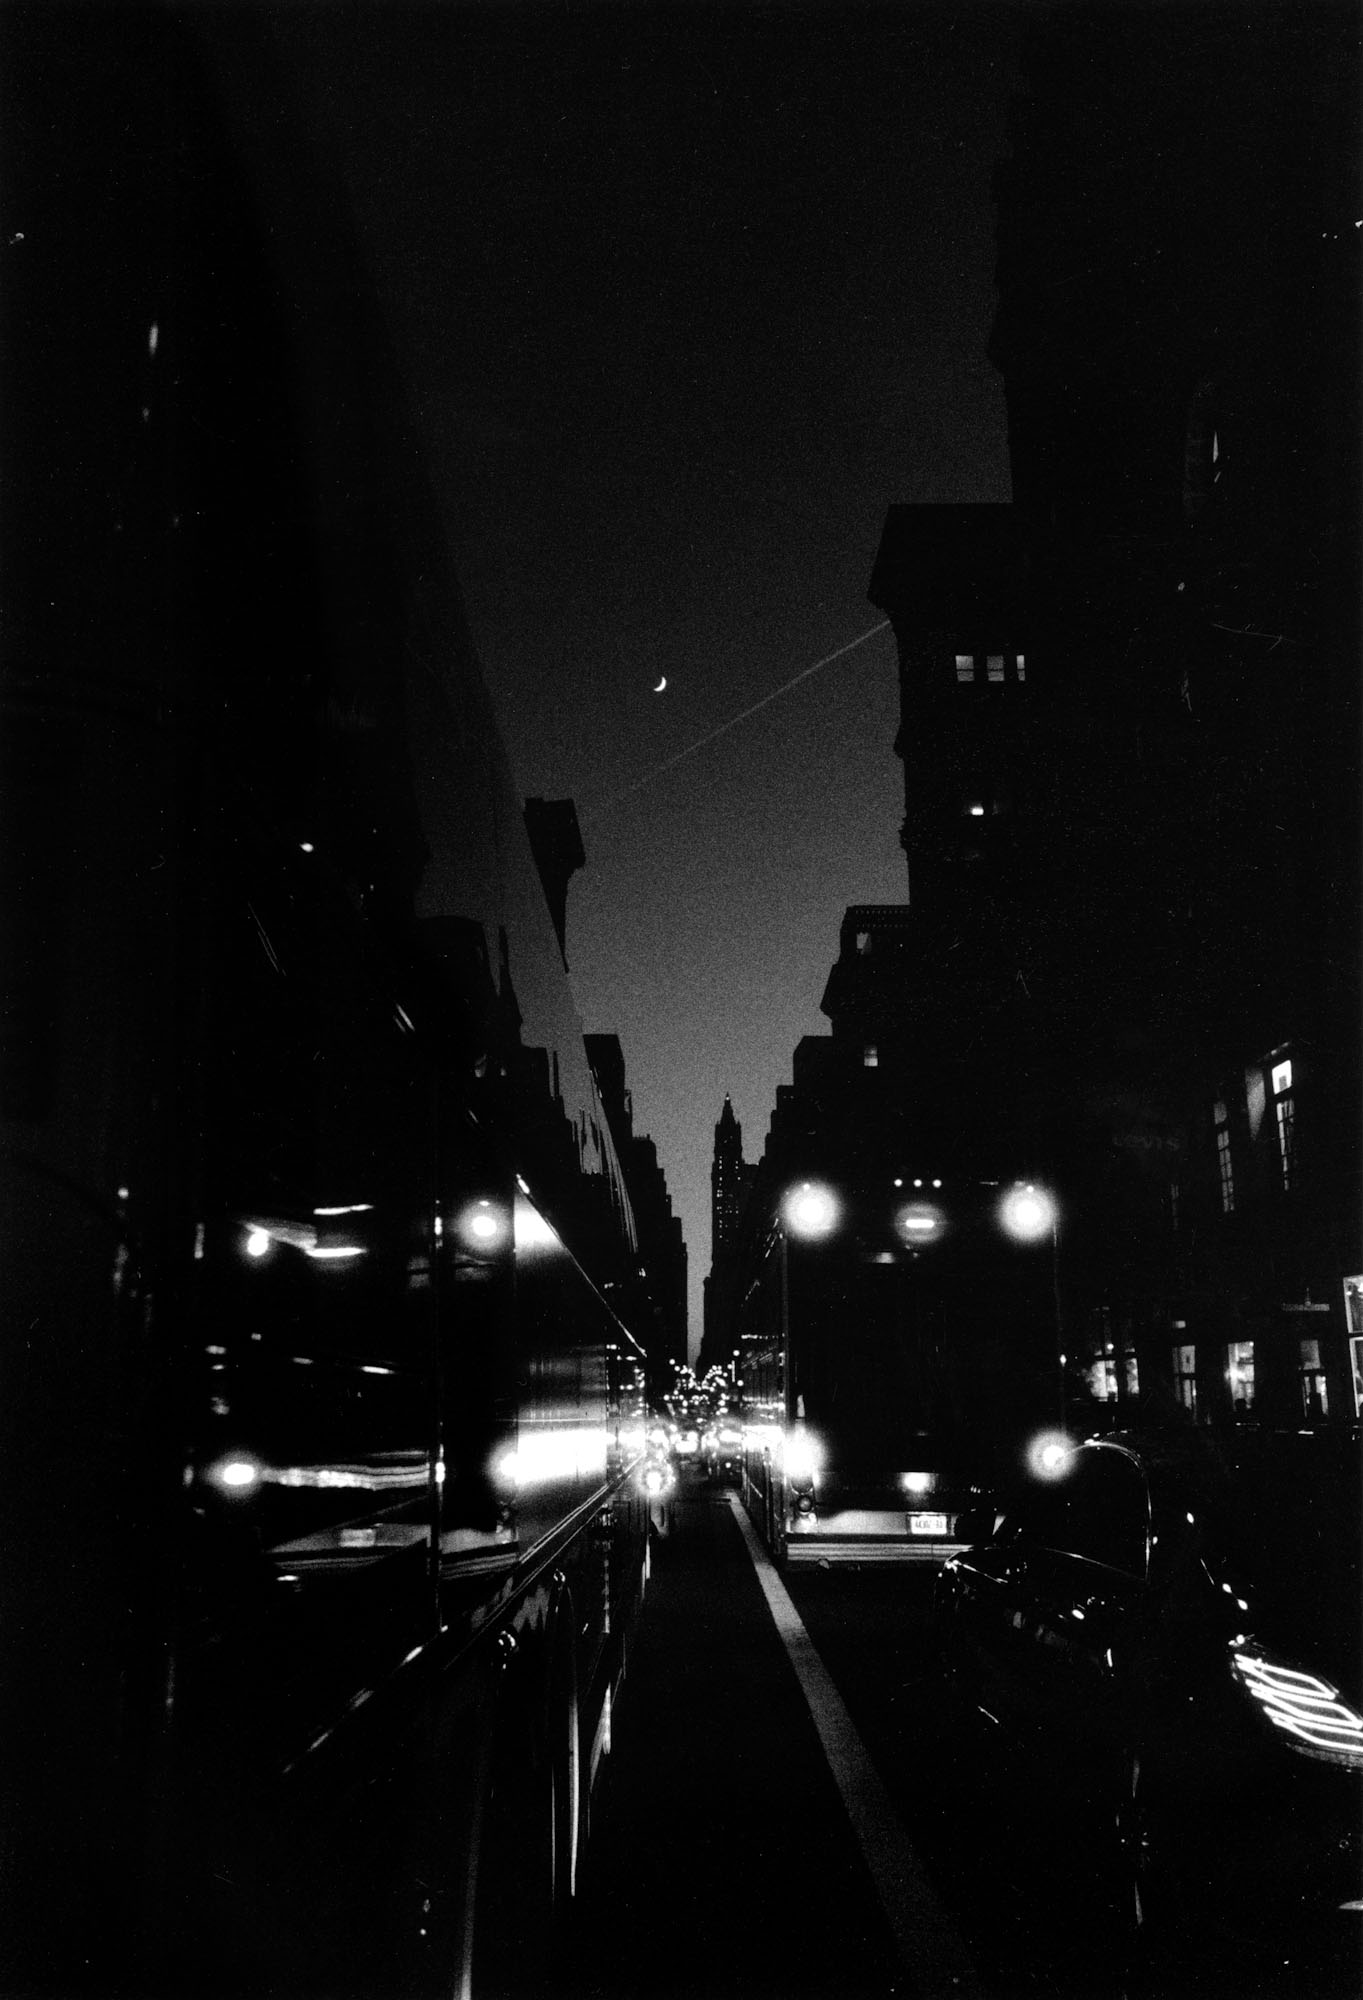 New-york-cooper-ray-14